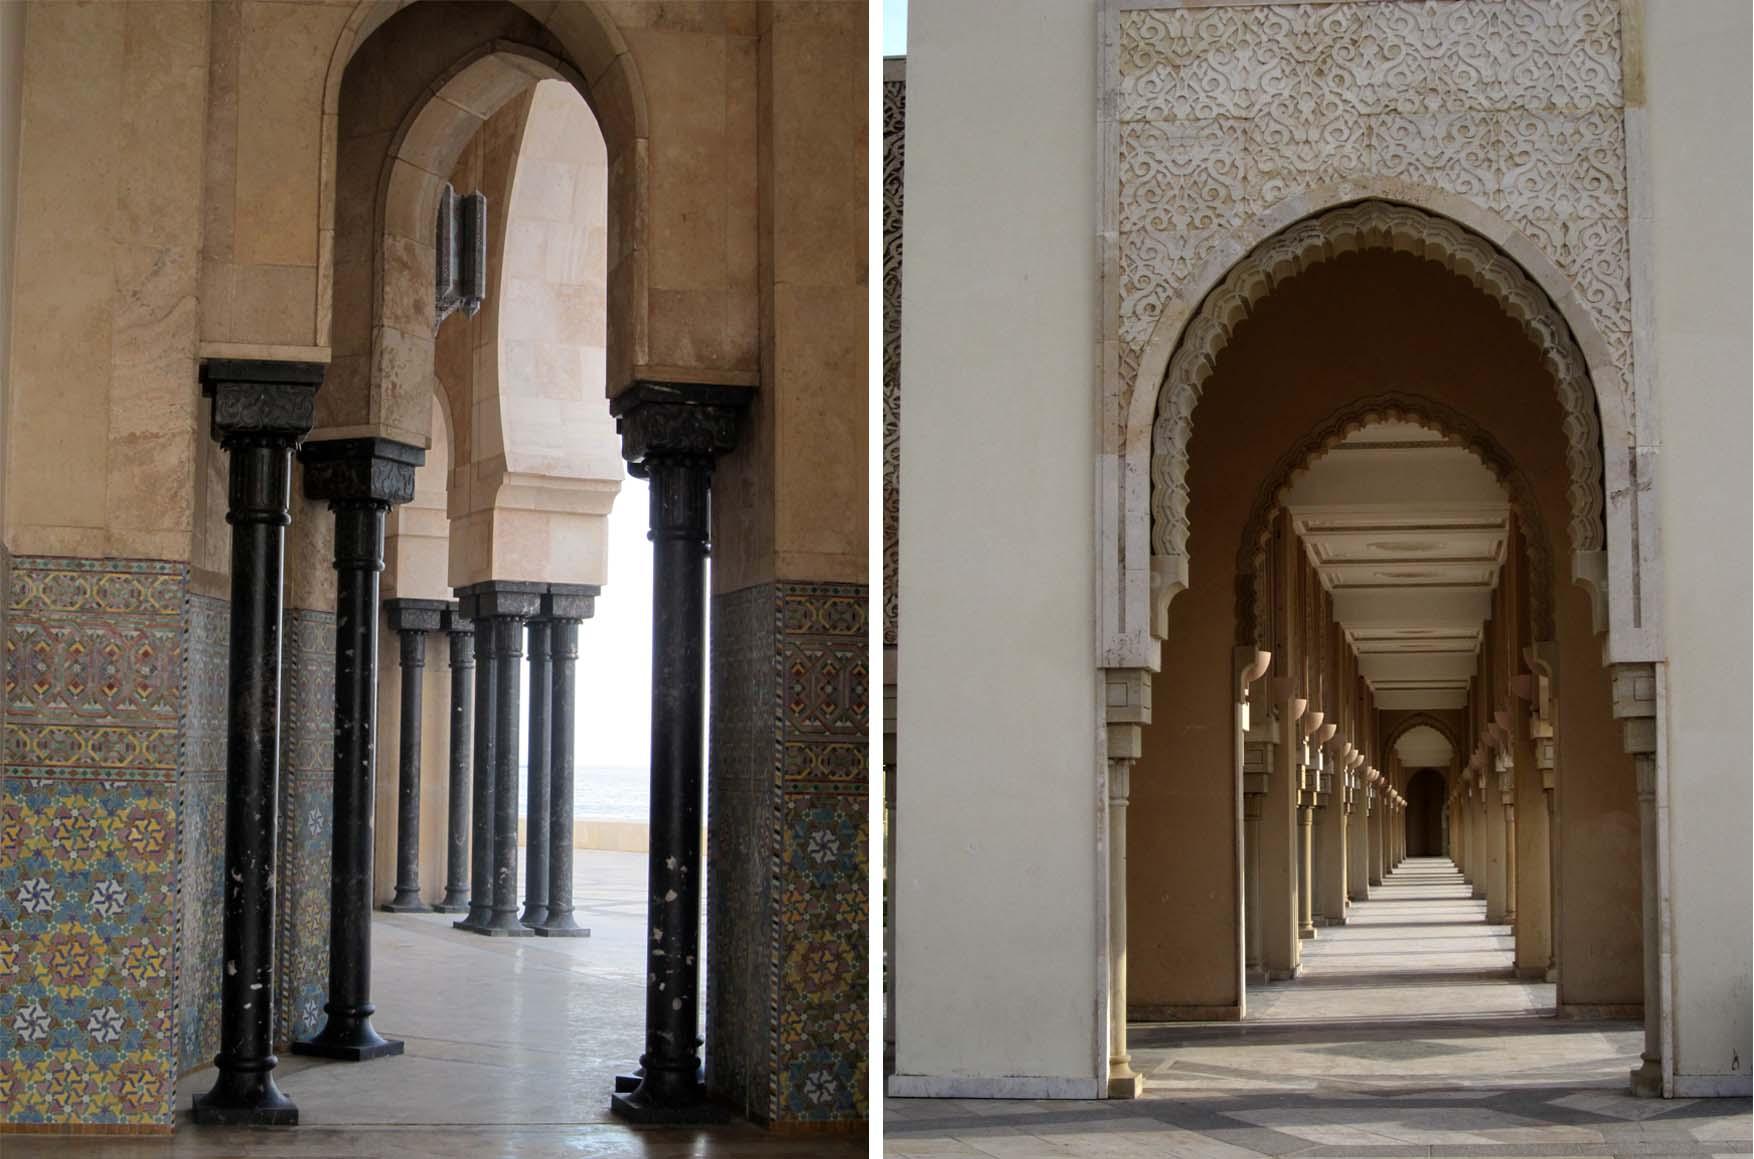 99 maroko kazablanka velika dzamija